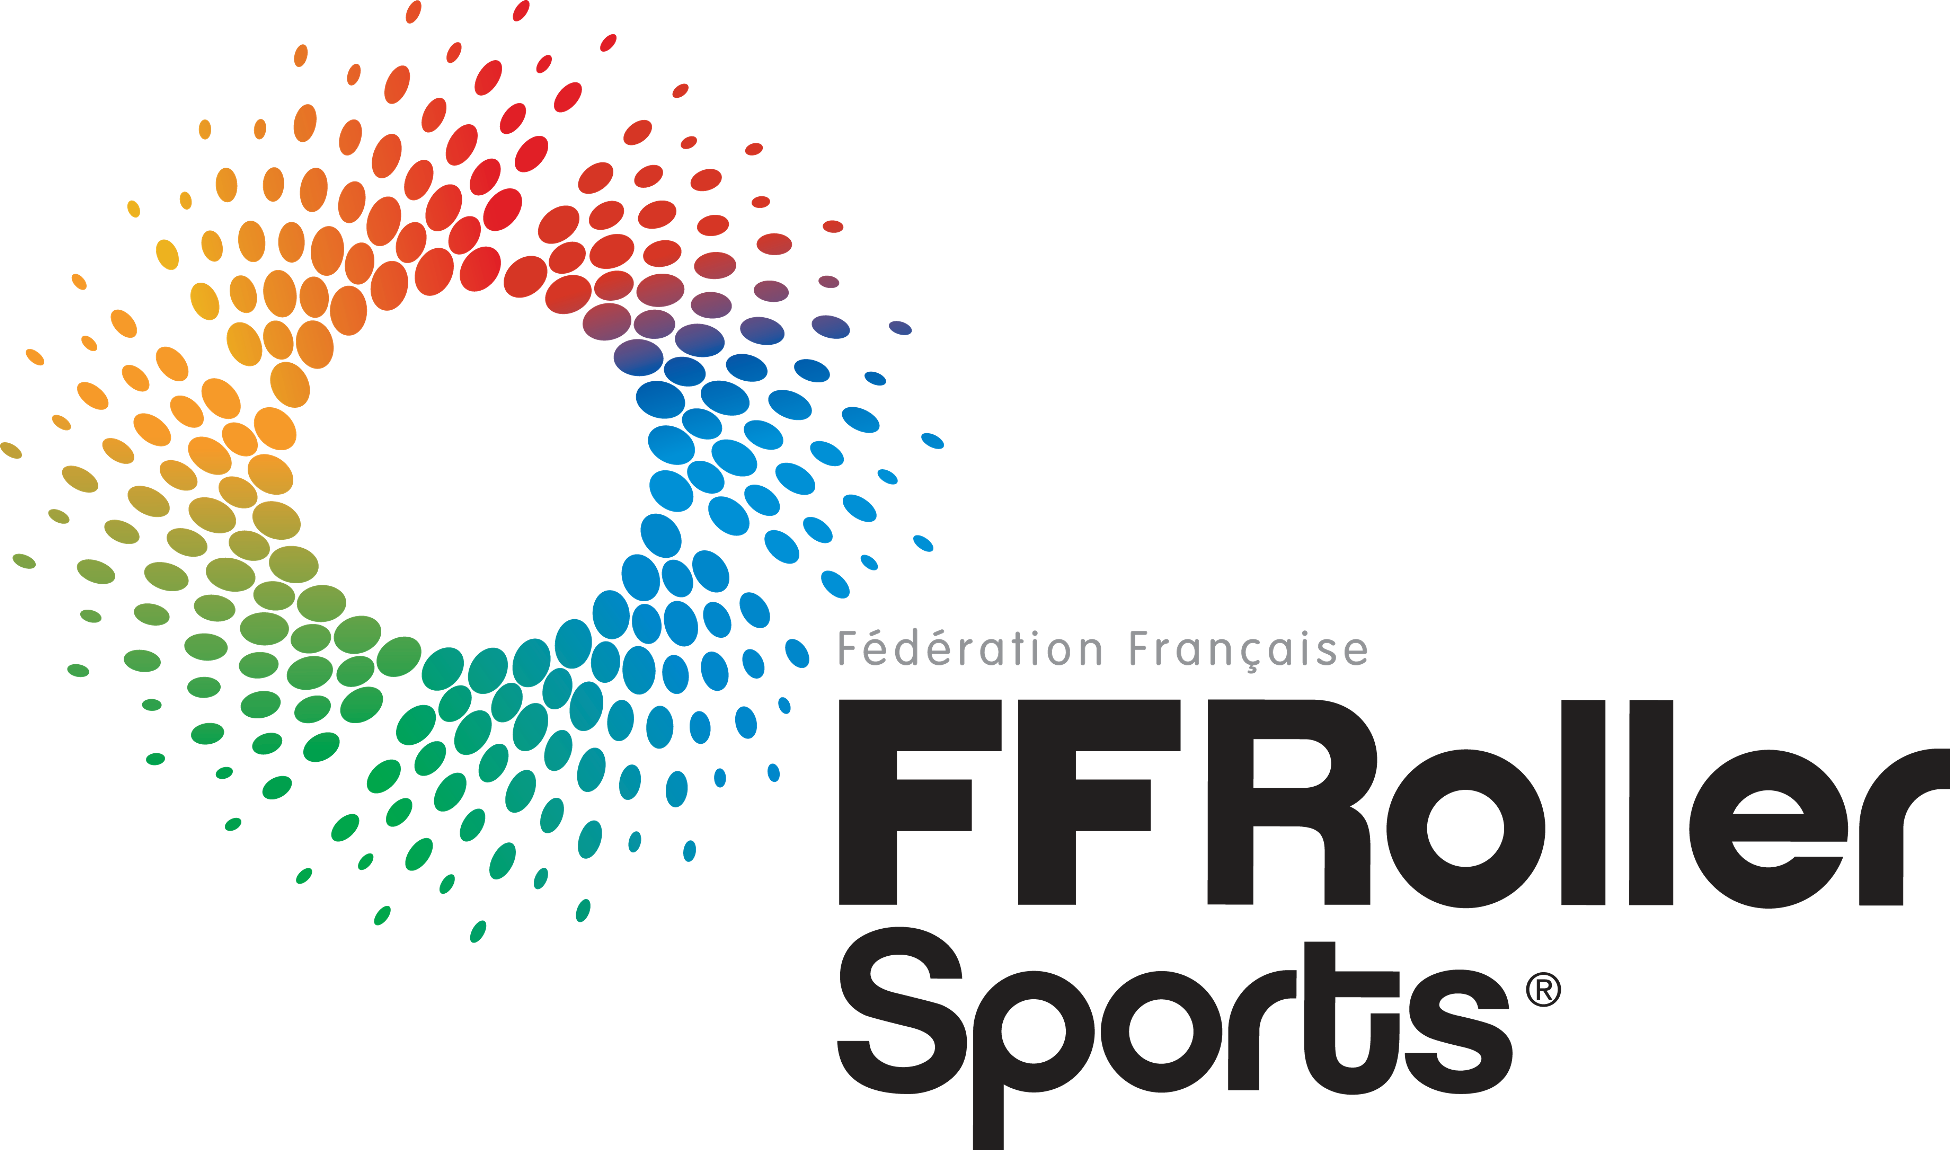 Fédération_française_Roller_Sports_logo_2011